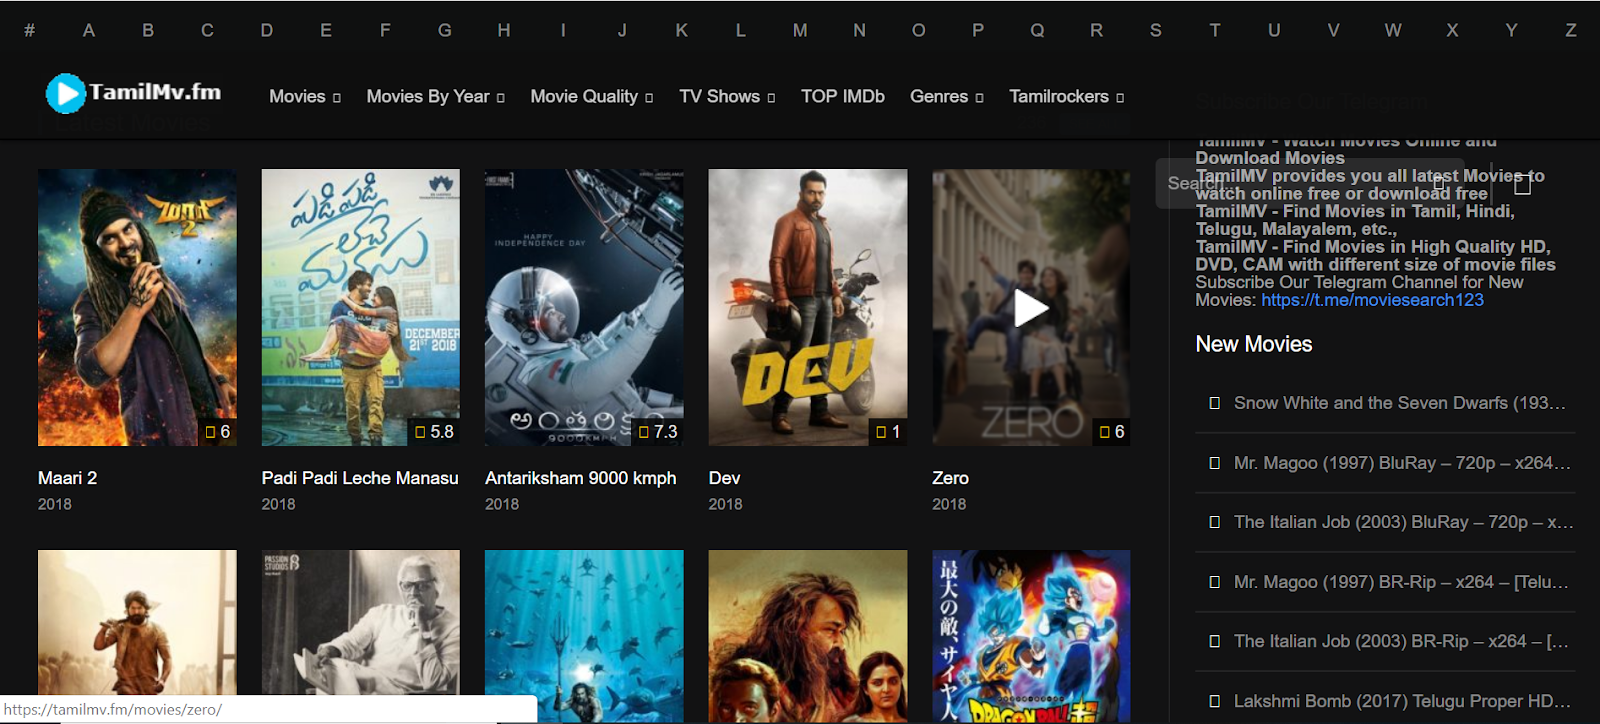 Top 10 Best Free Movie Downloading Website in India ( In